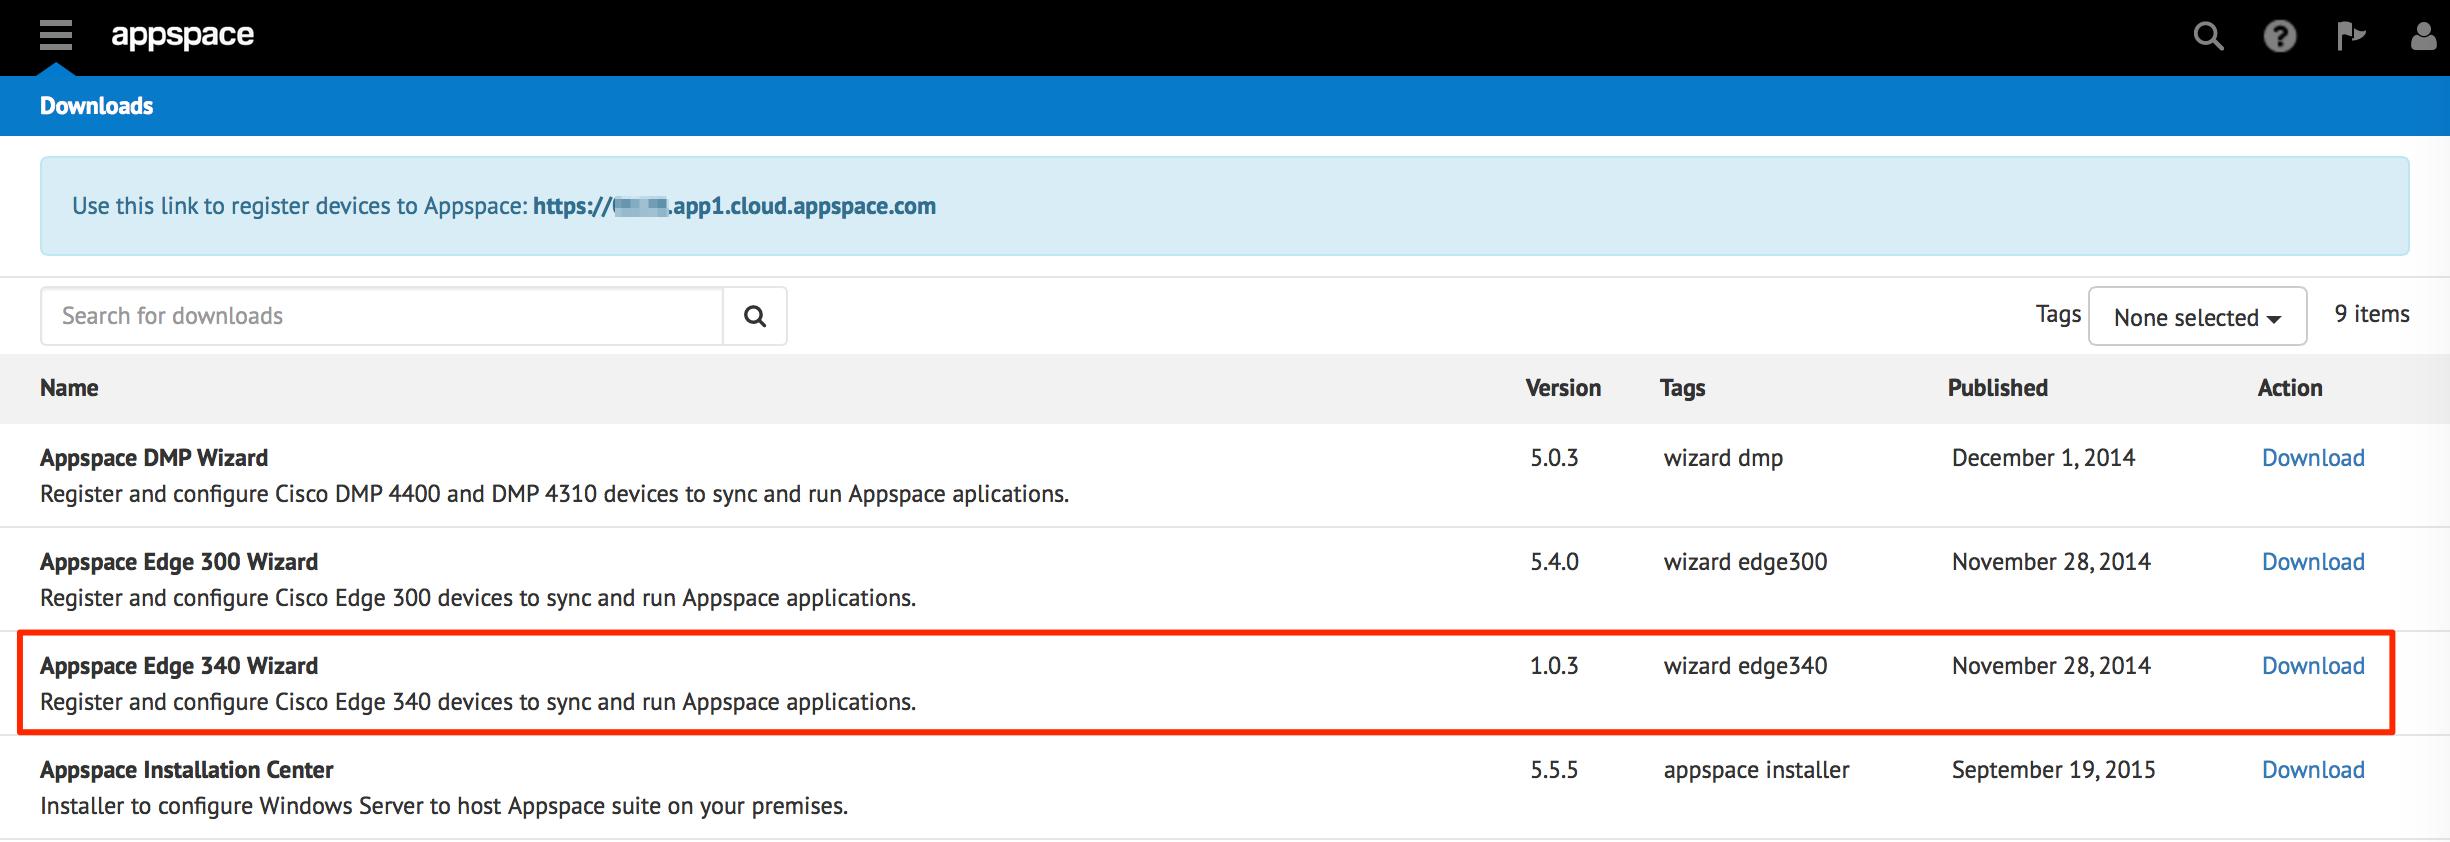 Edge 340 Registration — Appspace Core v5 9 Documentation